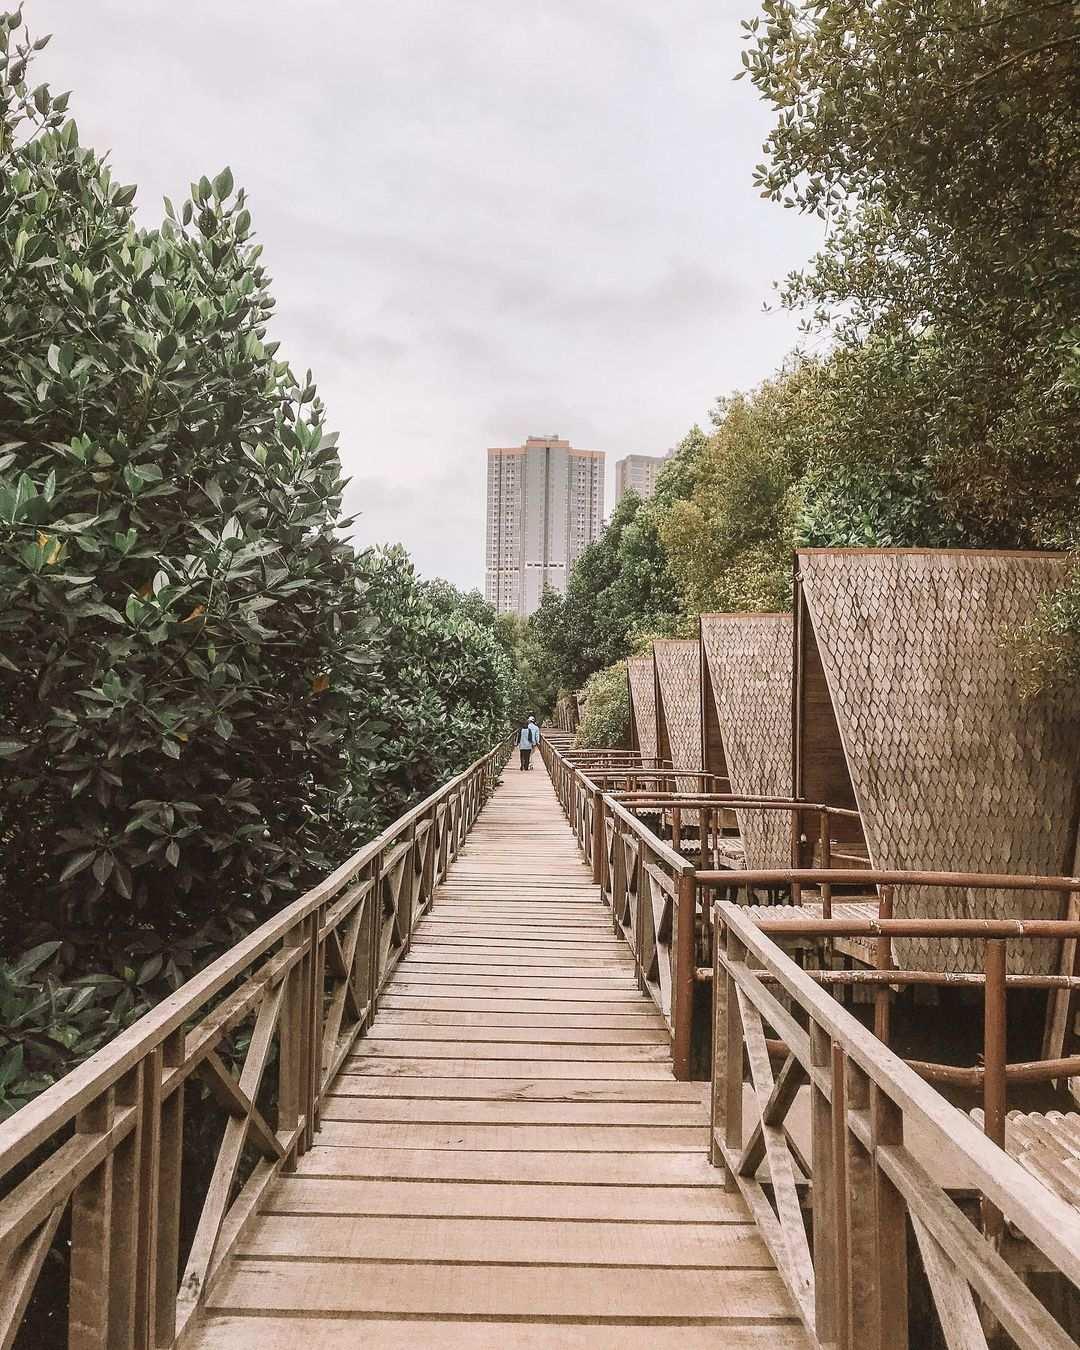 Tempat Menginap Di Hutan Mangrove PIK Image From @eatineraryid